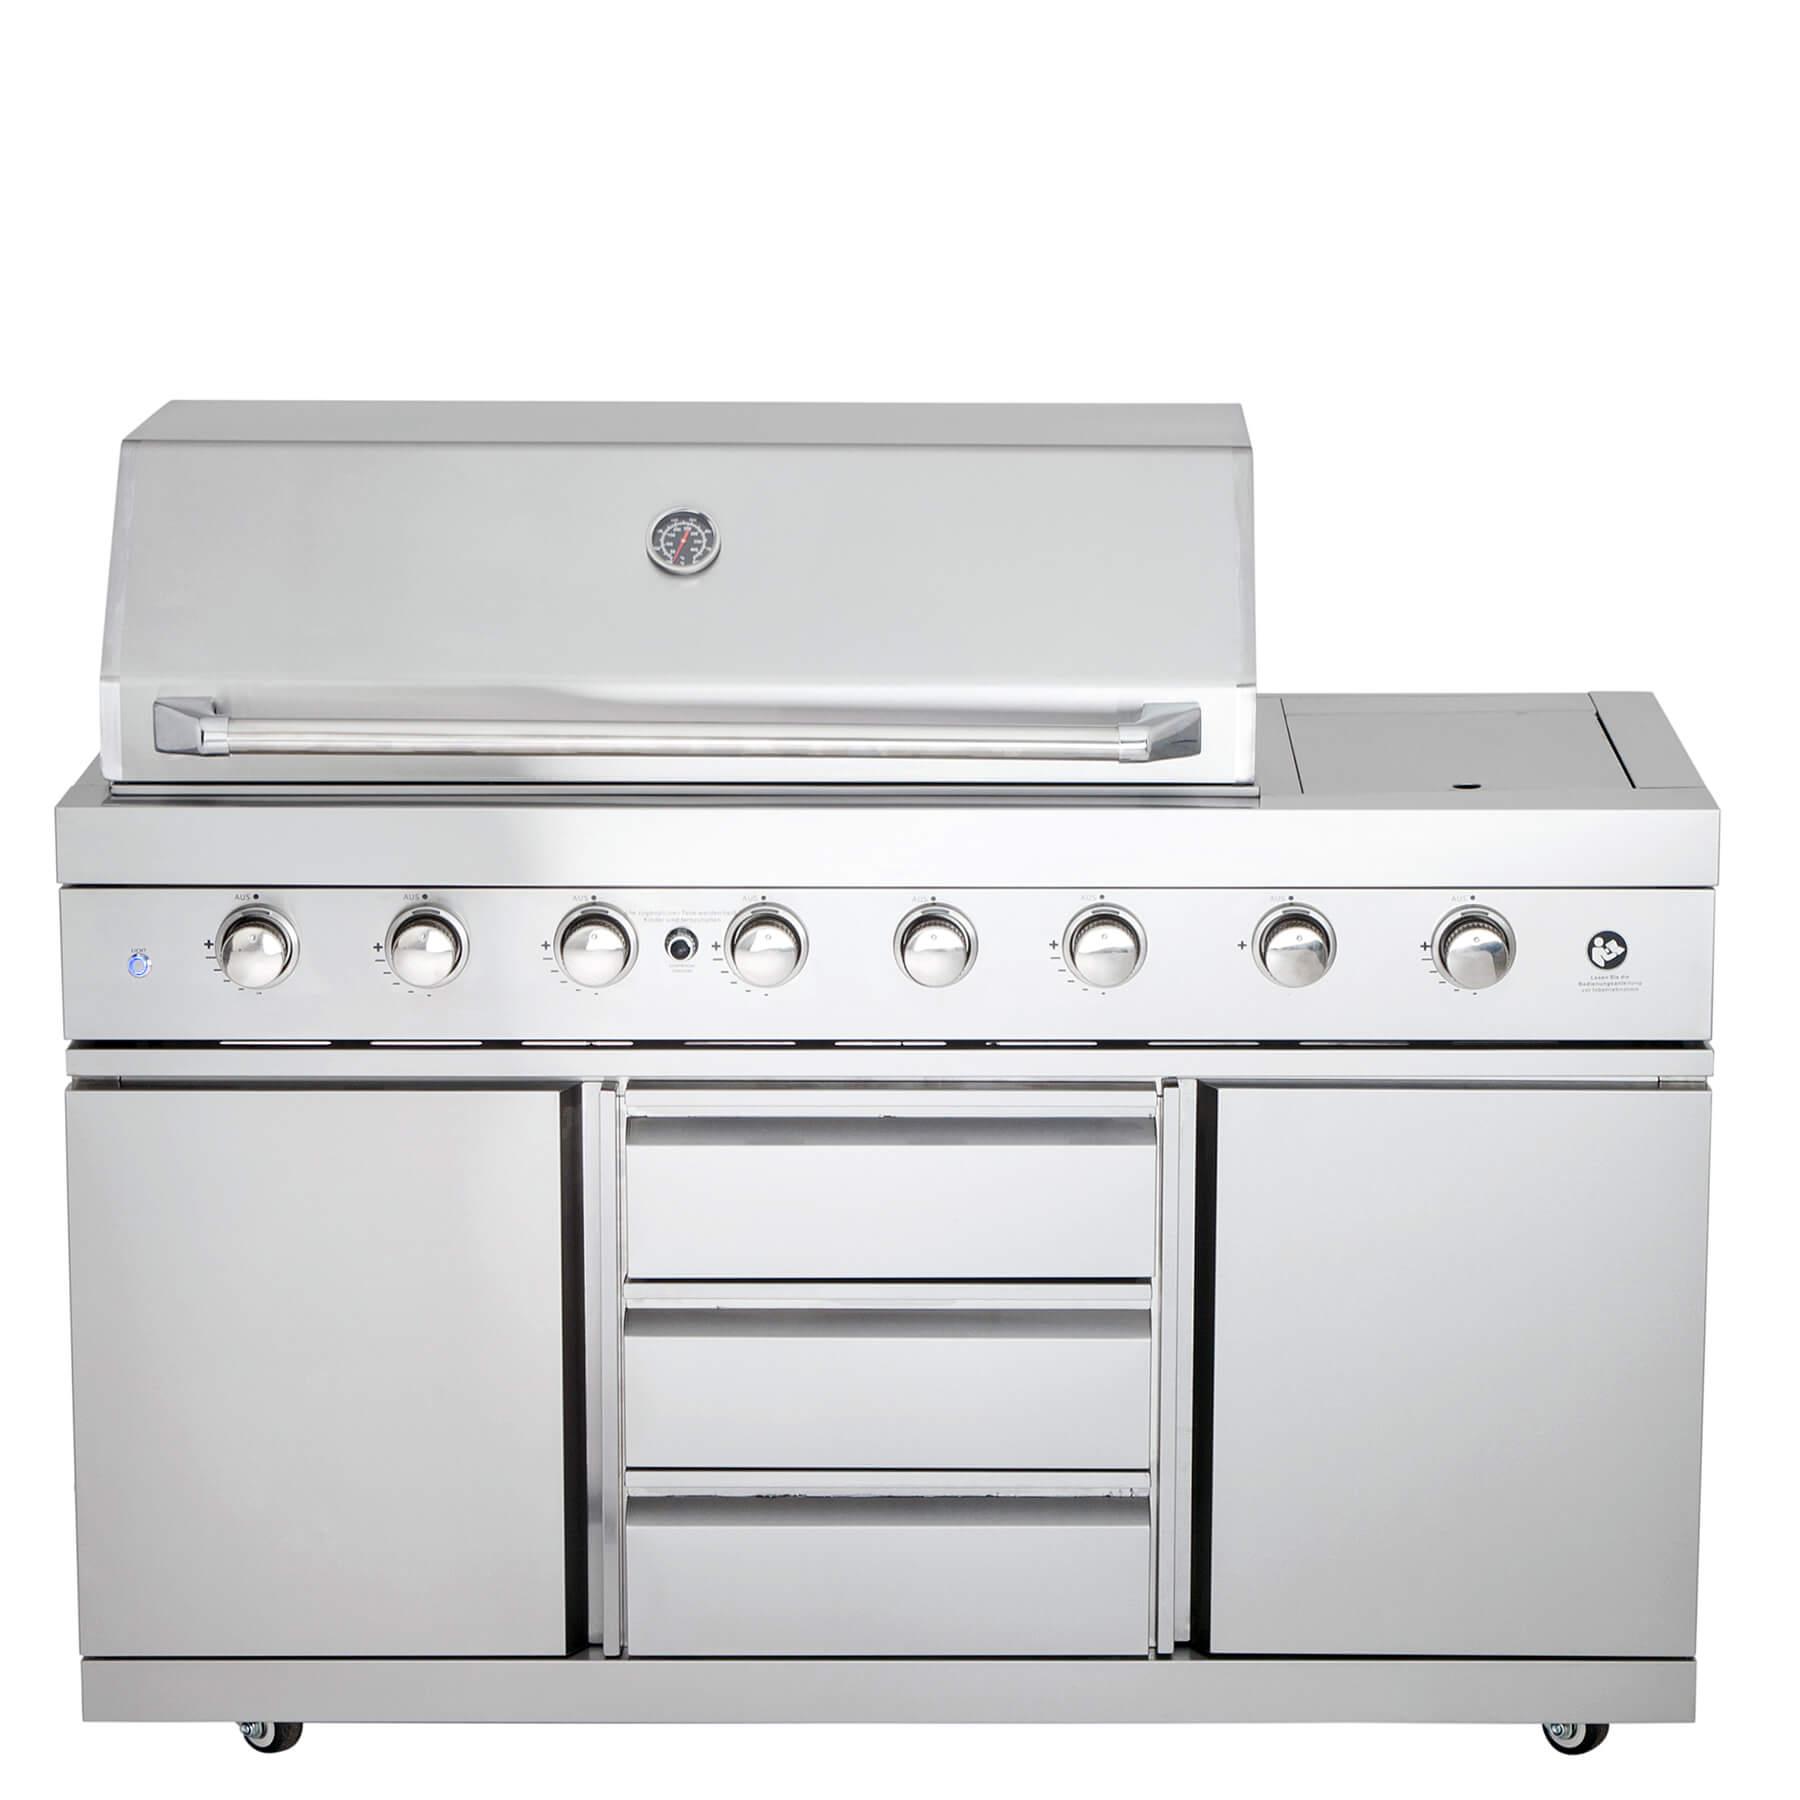 modul-grill-konfigurator-grundgrill-inkl-airsystem